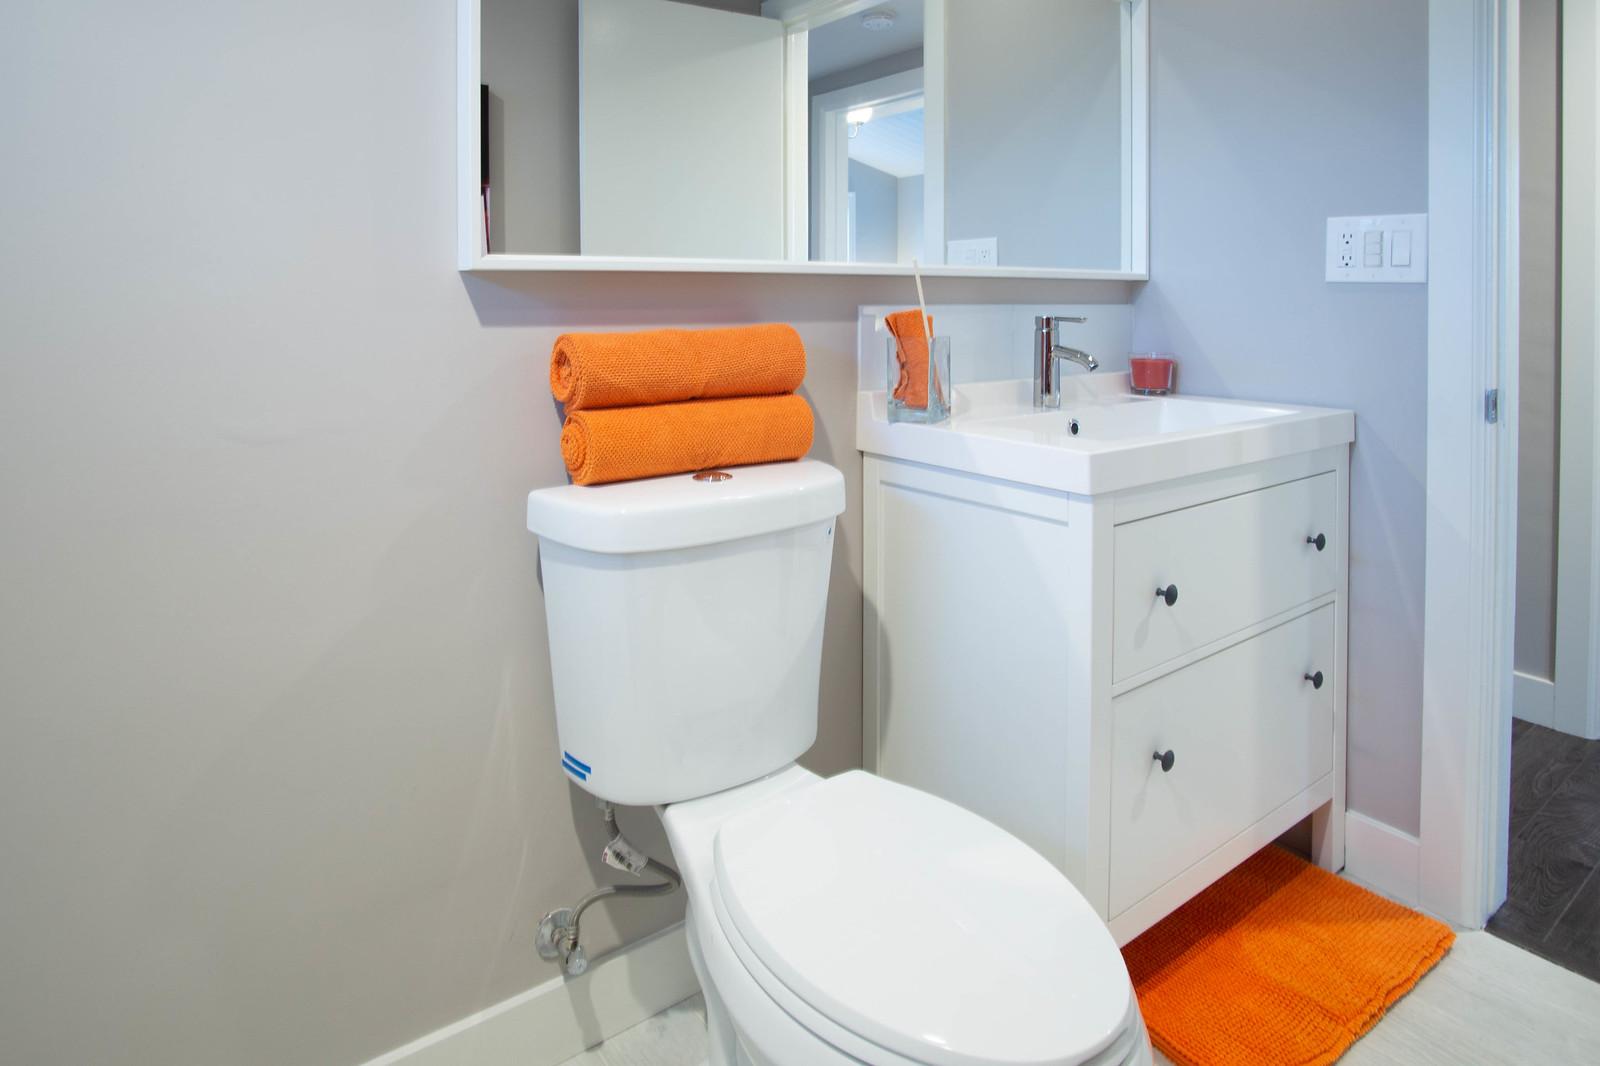 13912 Mansa Dr - Bathroom  2-4